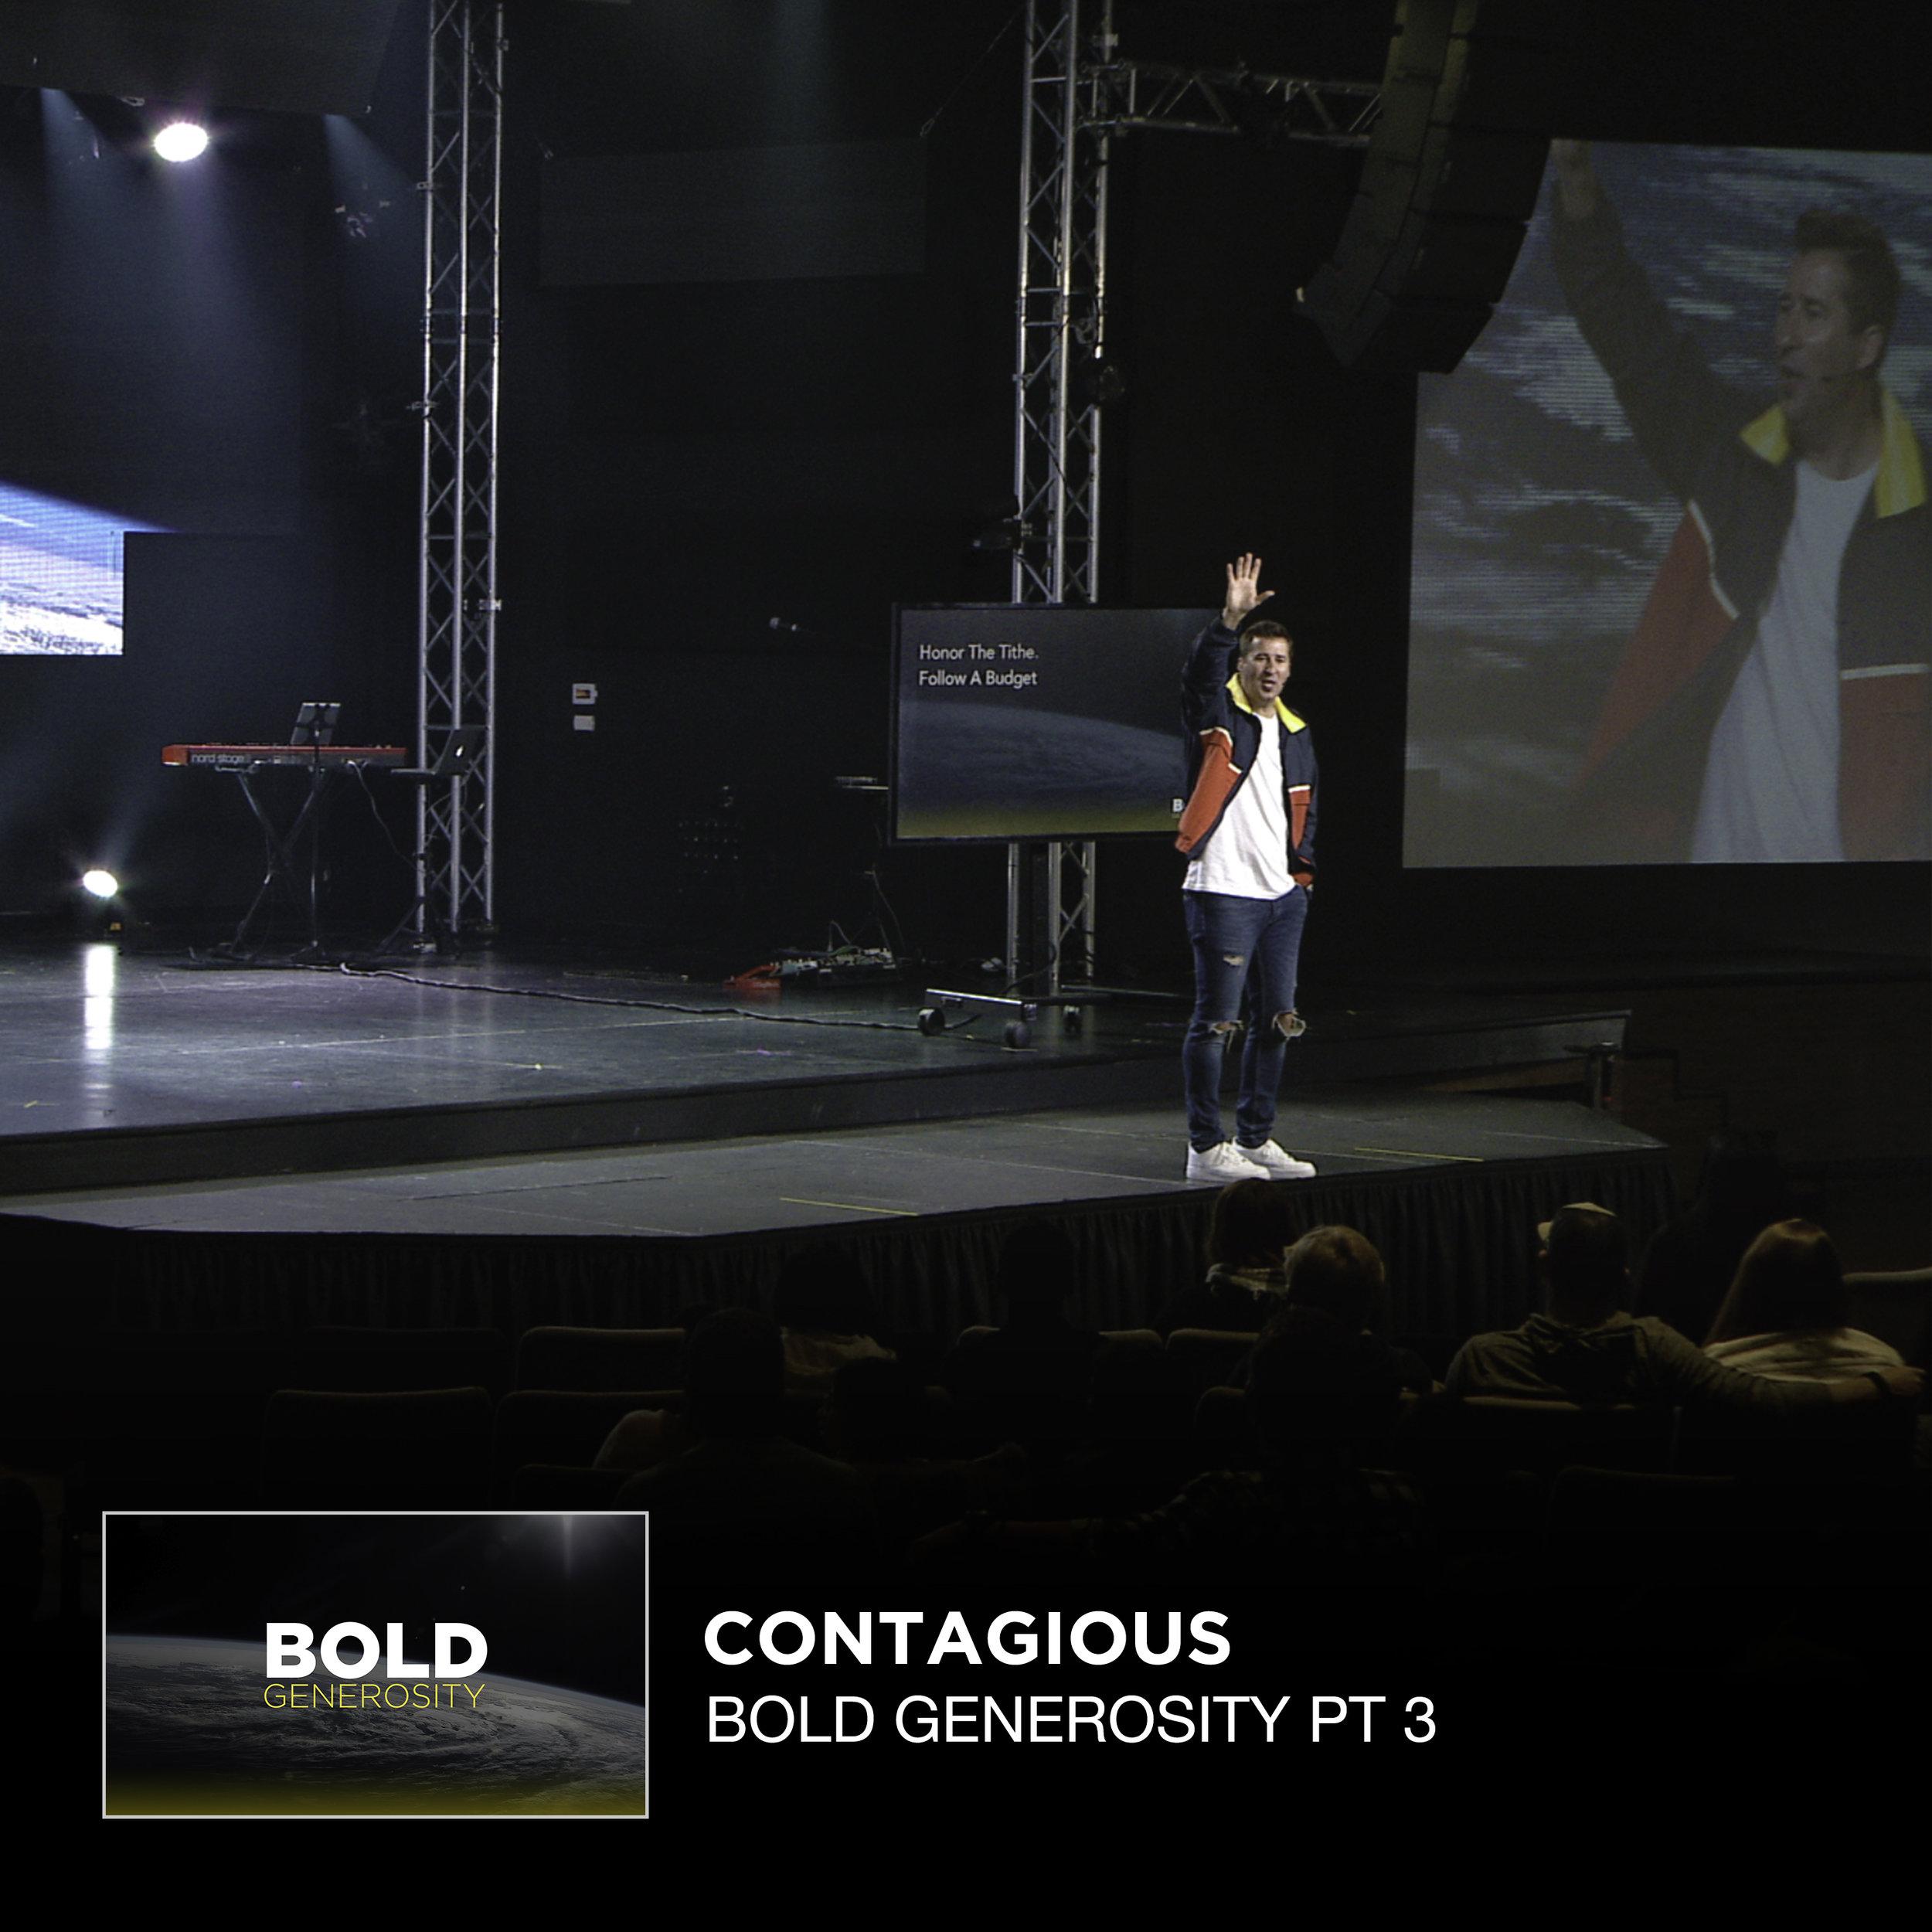 Bold Generosity Pt 3 _ Contagious _ Jared Ming Web.jpg